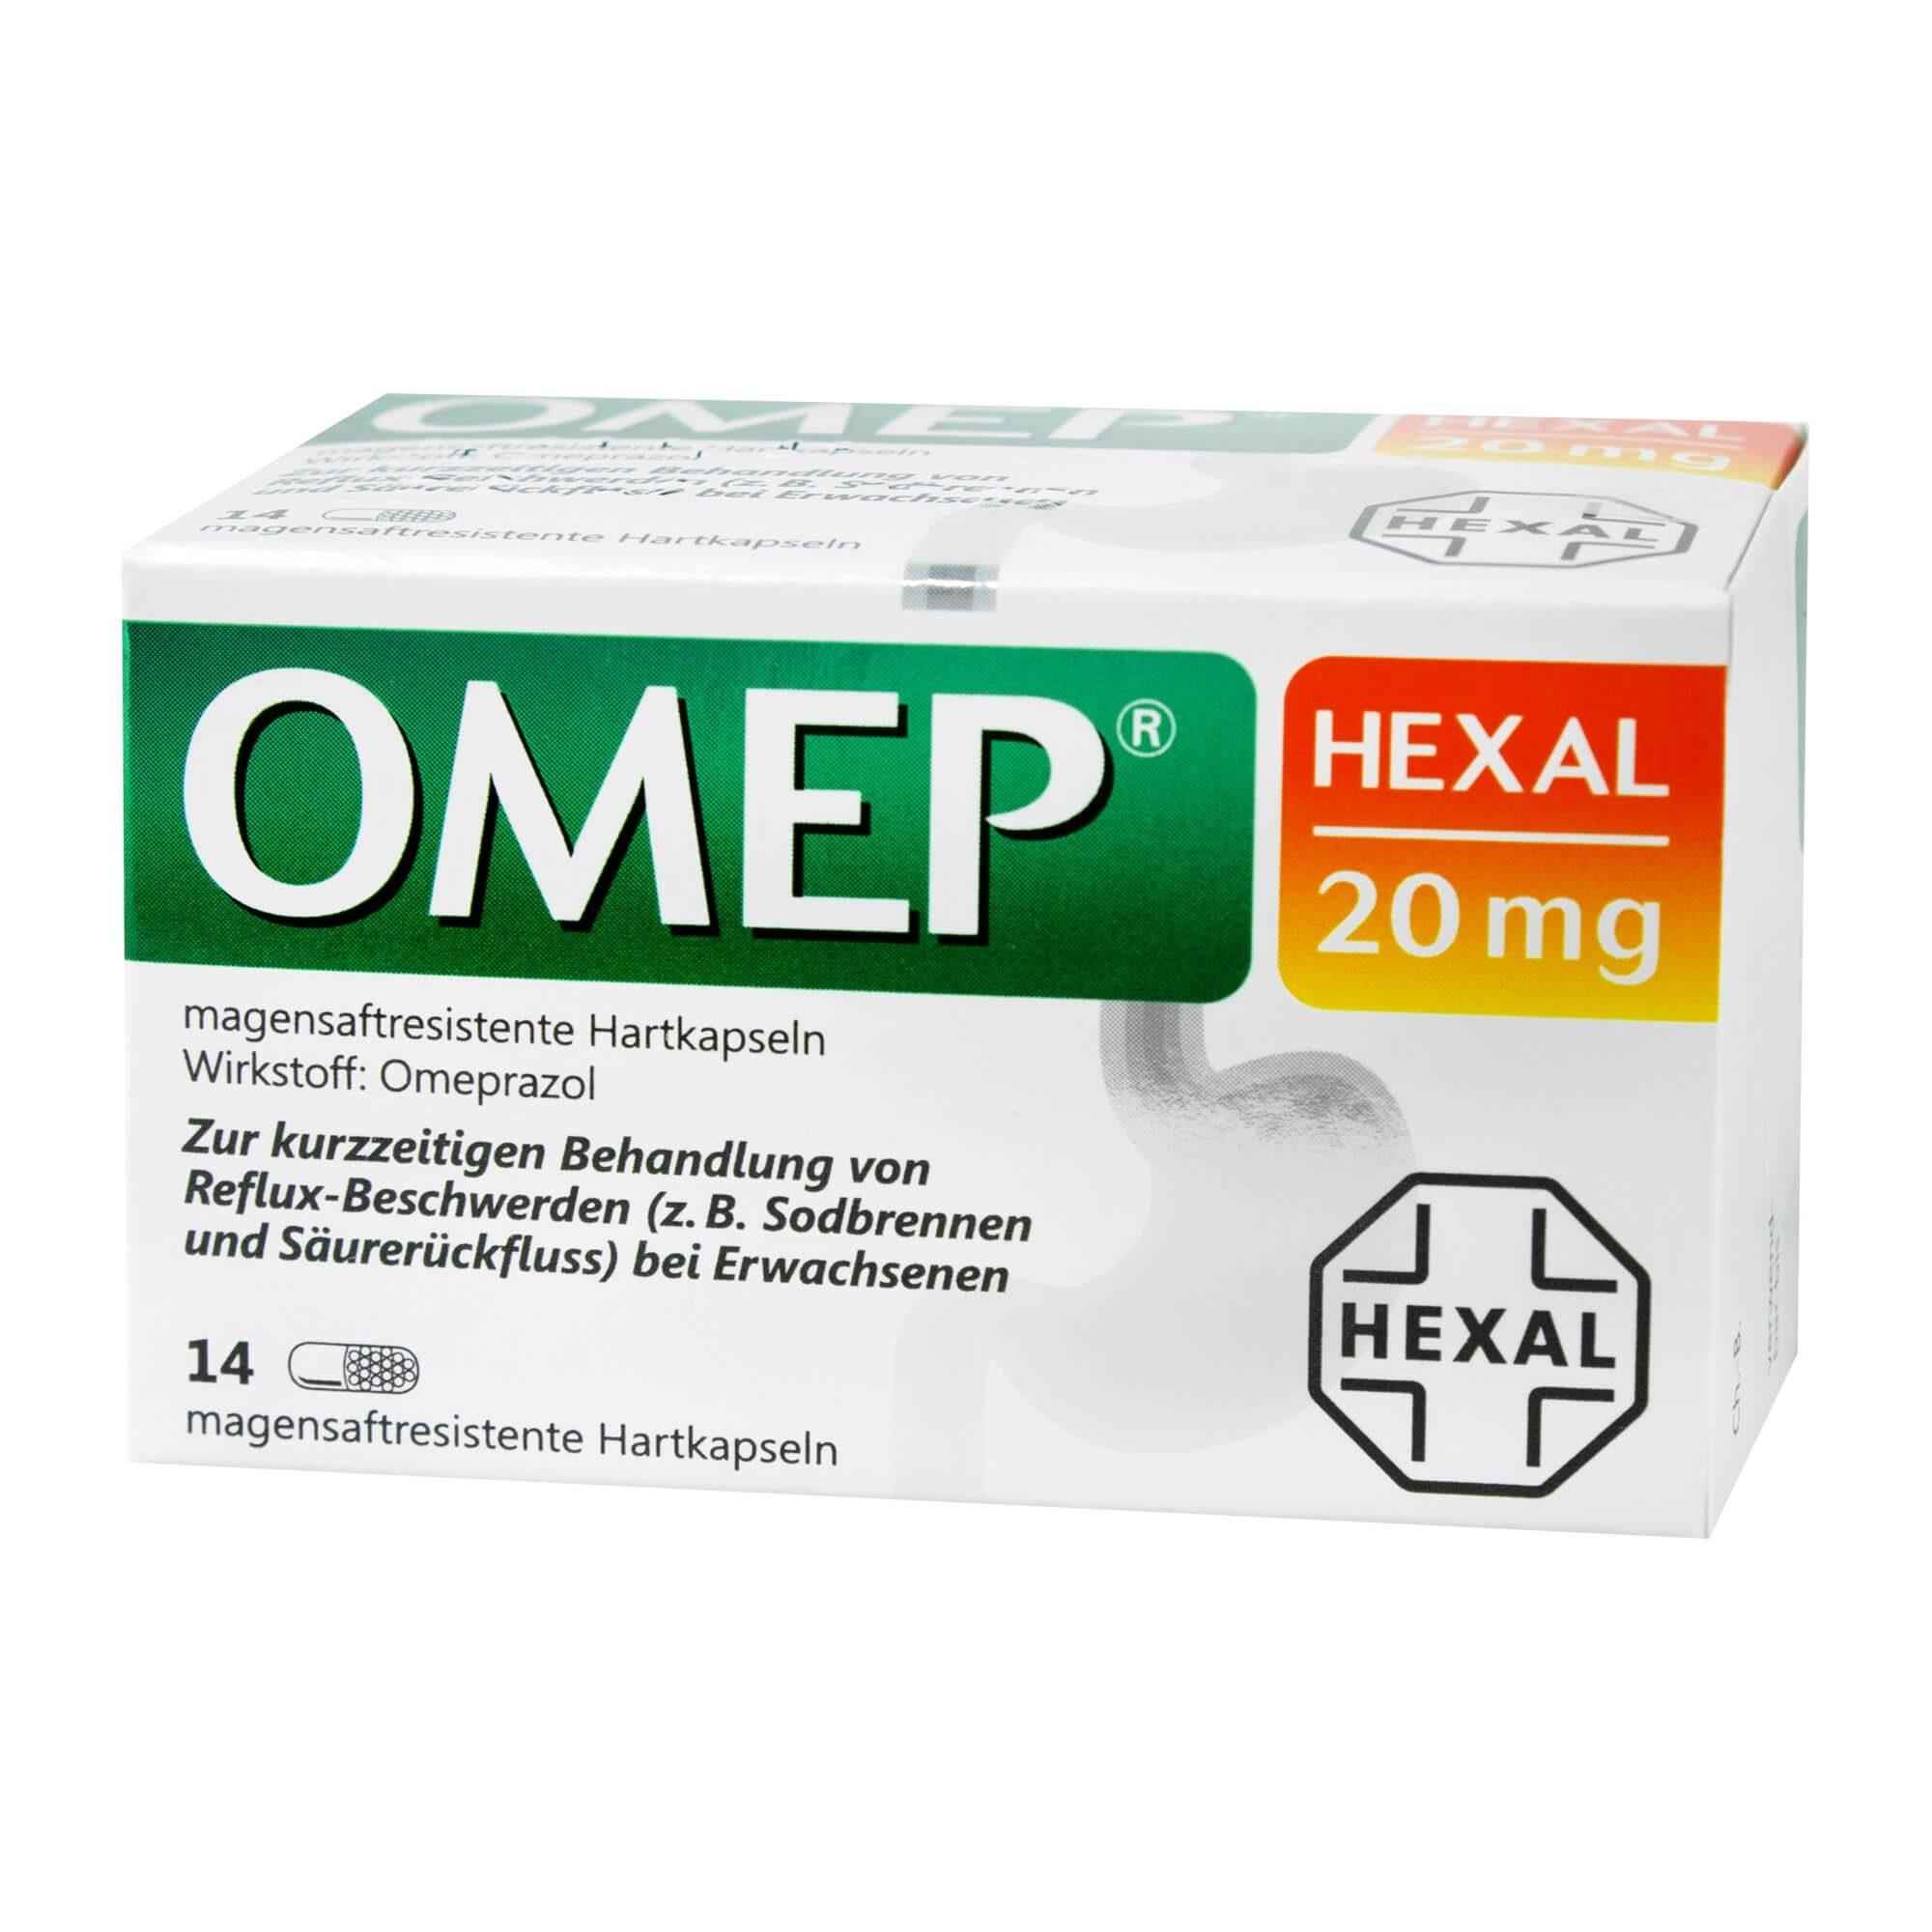 omep Hexal 20mg magensaftresistente Hartkapseln , 14 St